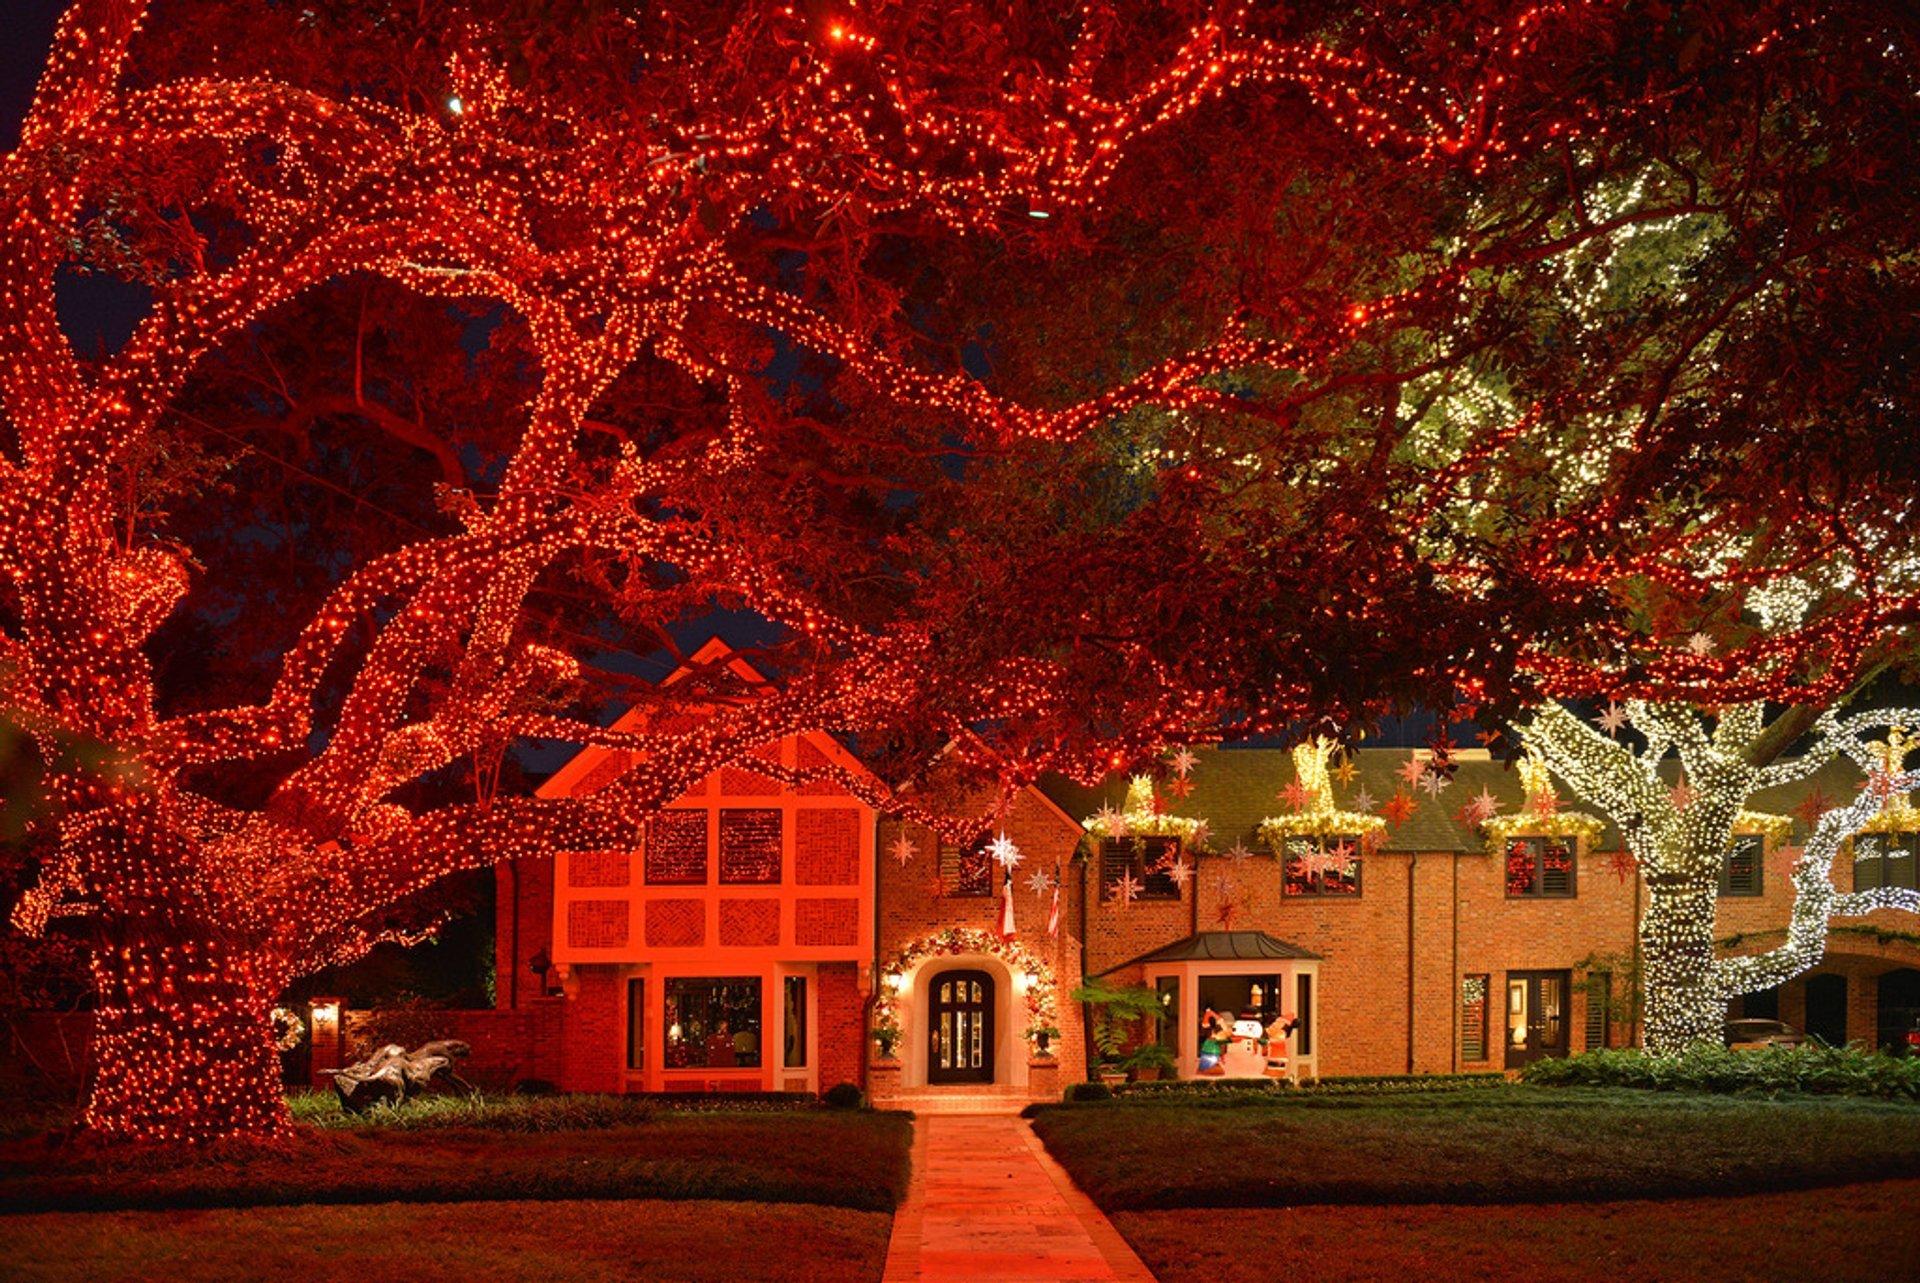 Christmas Lights Houston 2020 Houston Christmas Lights 2020 2021 in Texas   Dates